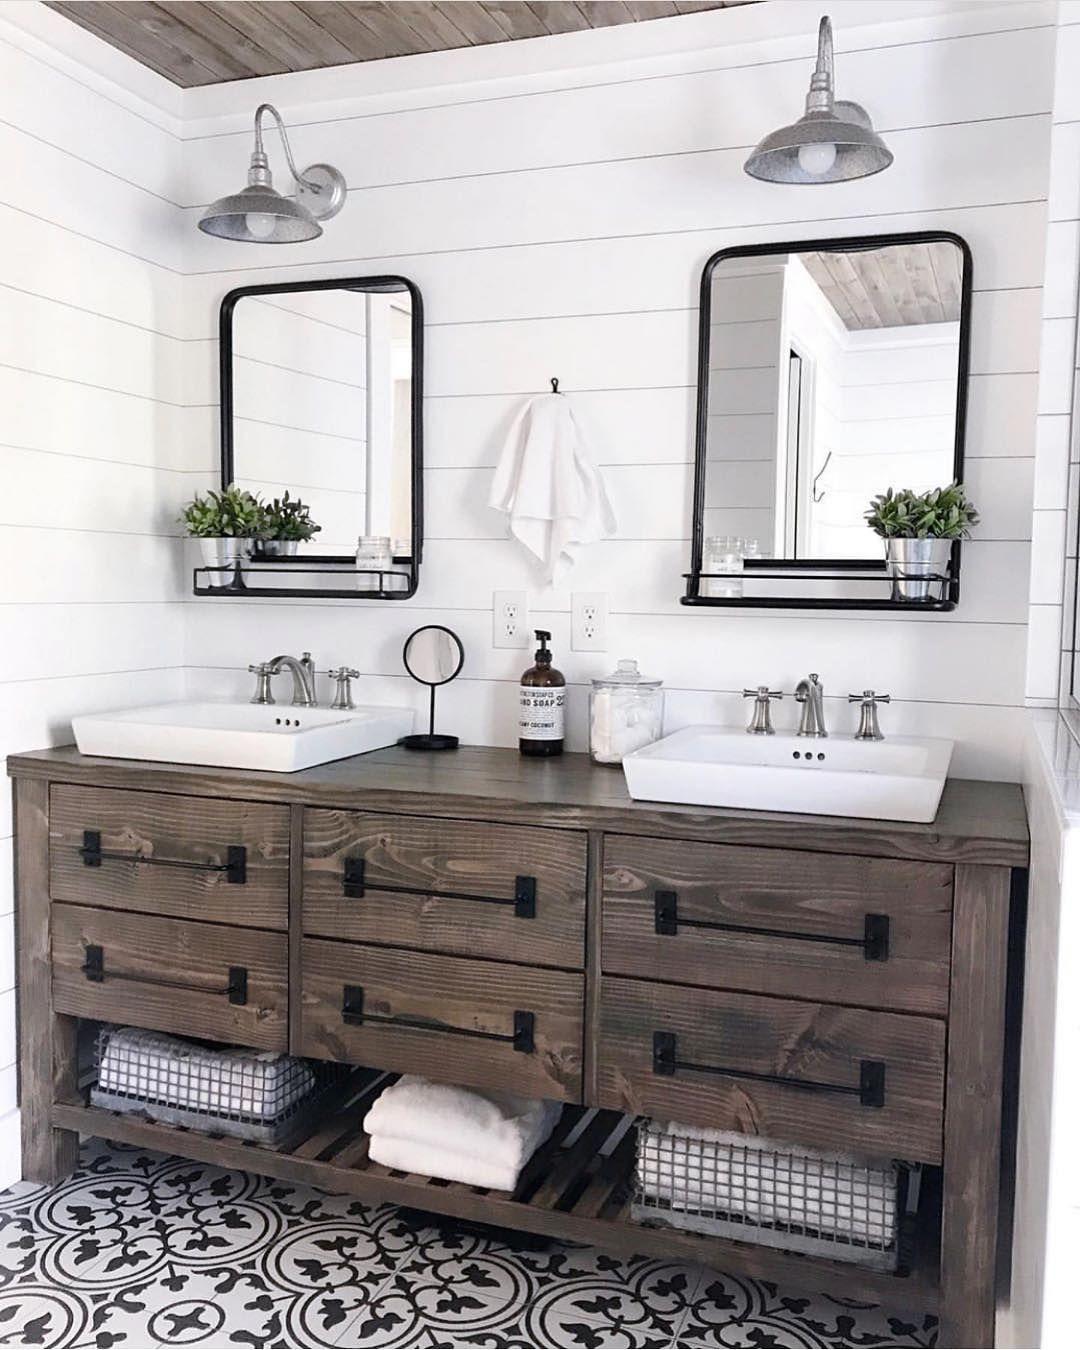 60 Gorgeous Bathroom Countertops Ideas That Make Your Bathroom Look Elegant - Millions Grace